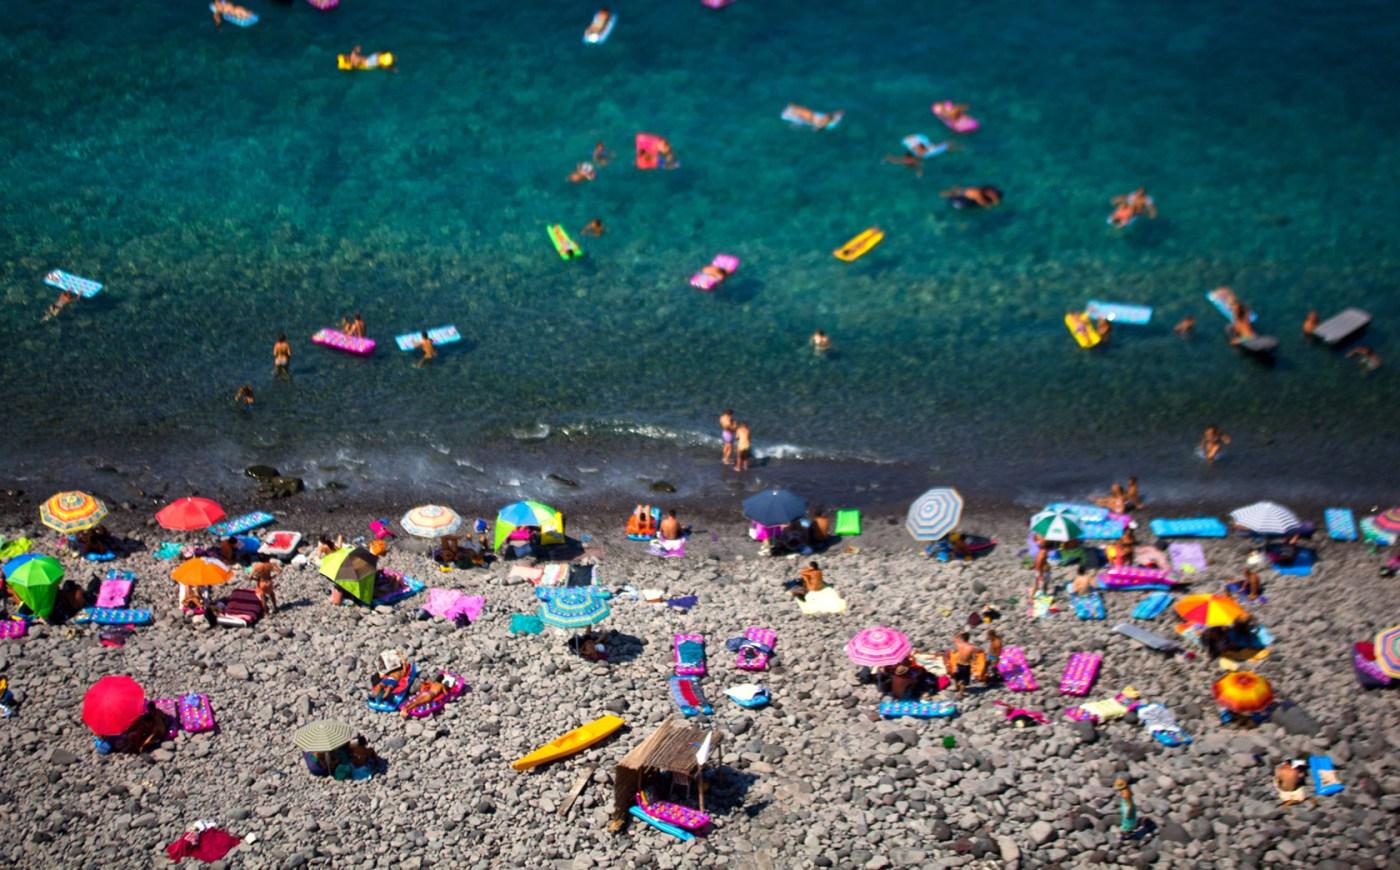 Lorenzo-Grifantini-Beach-Street-Photography-4